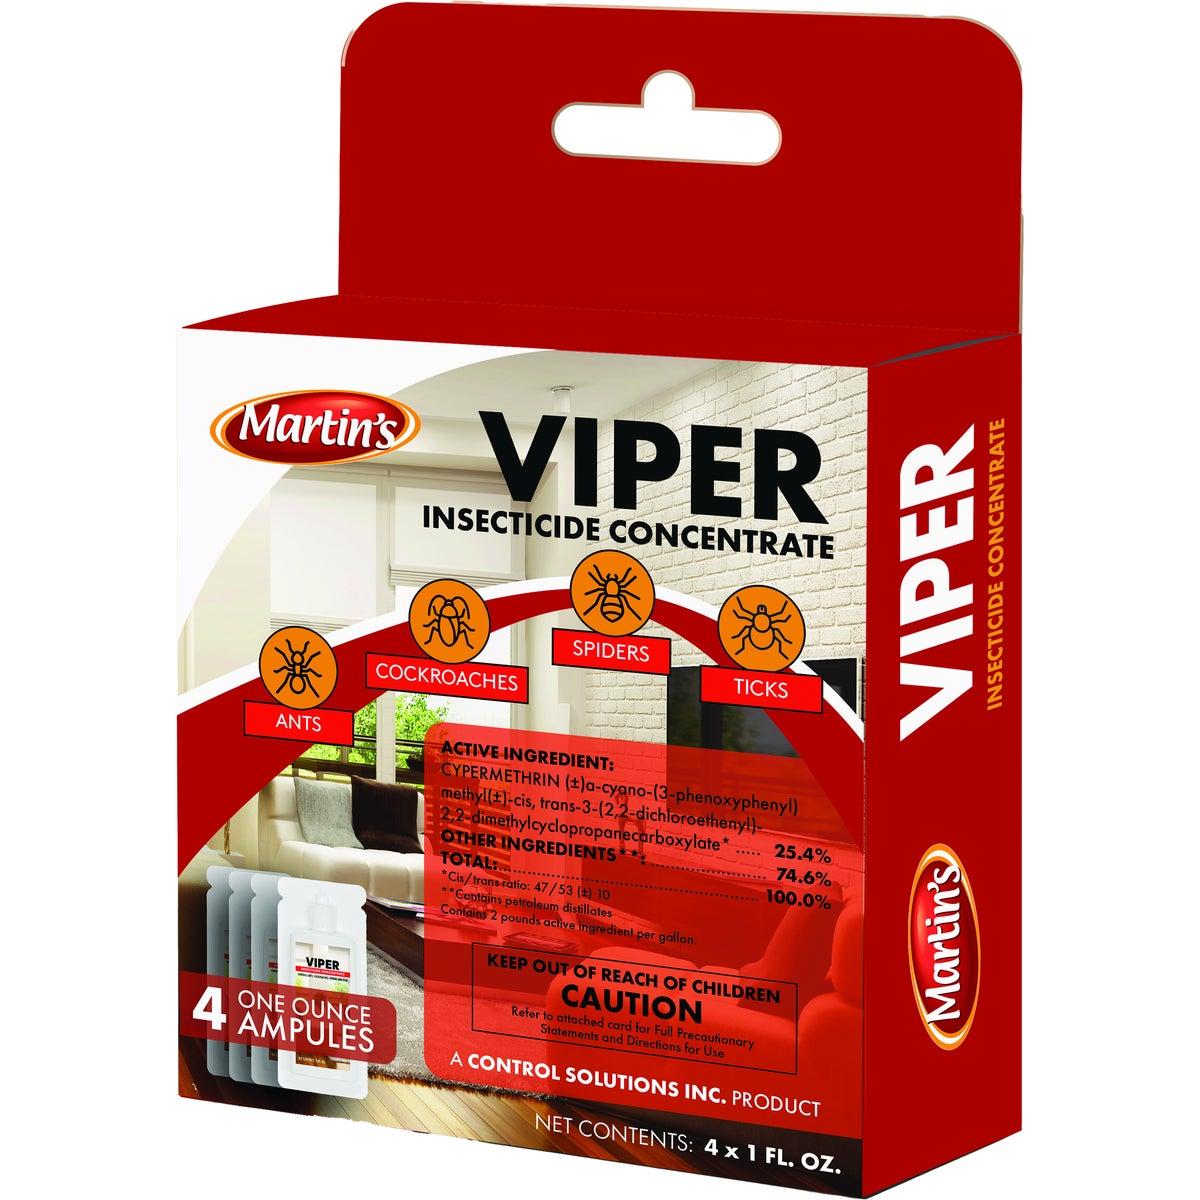 Viper Insect Killer